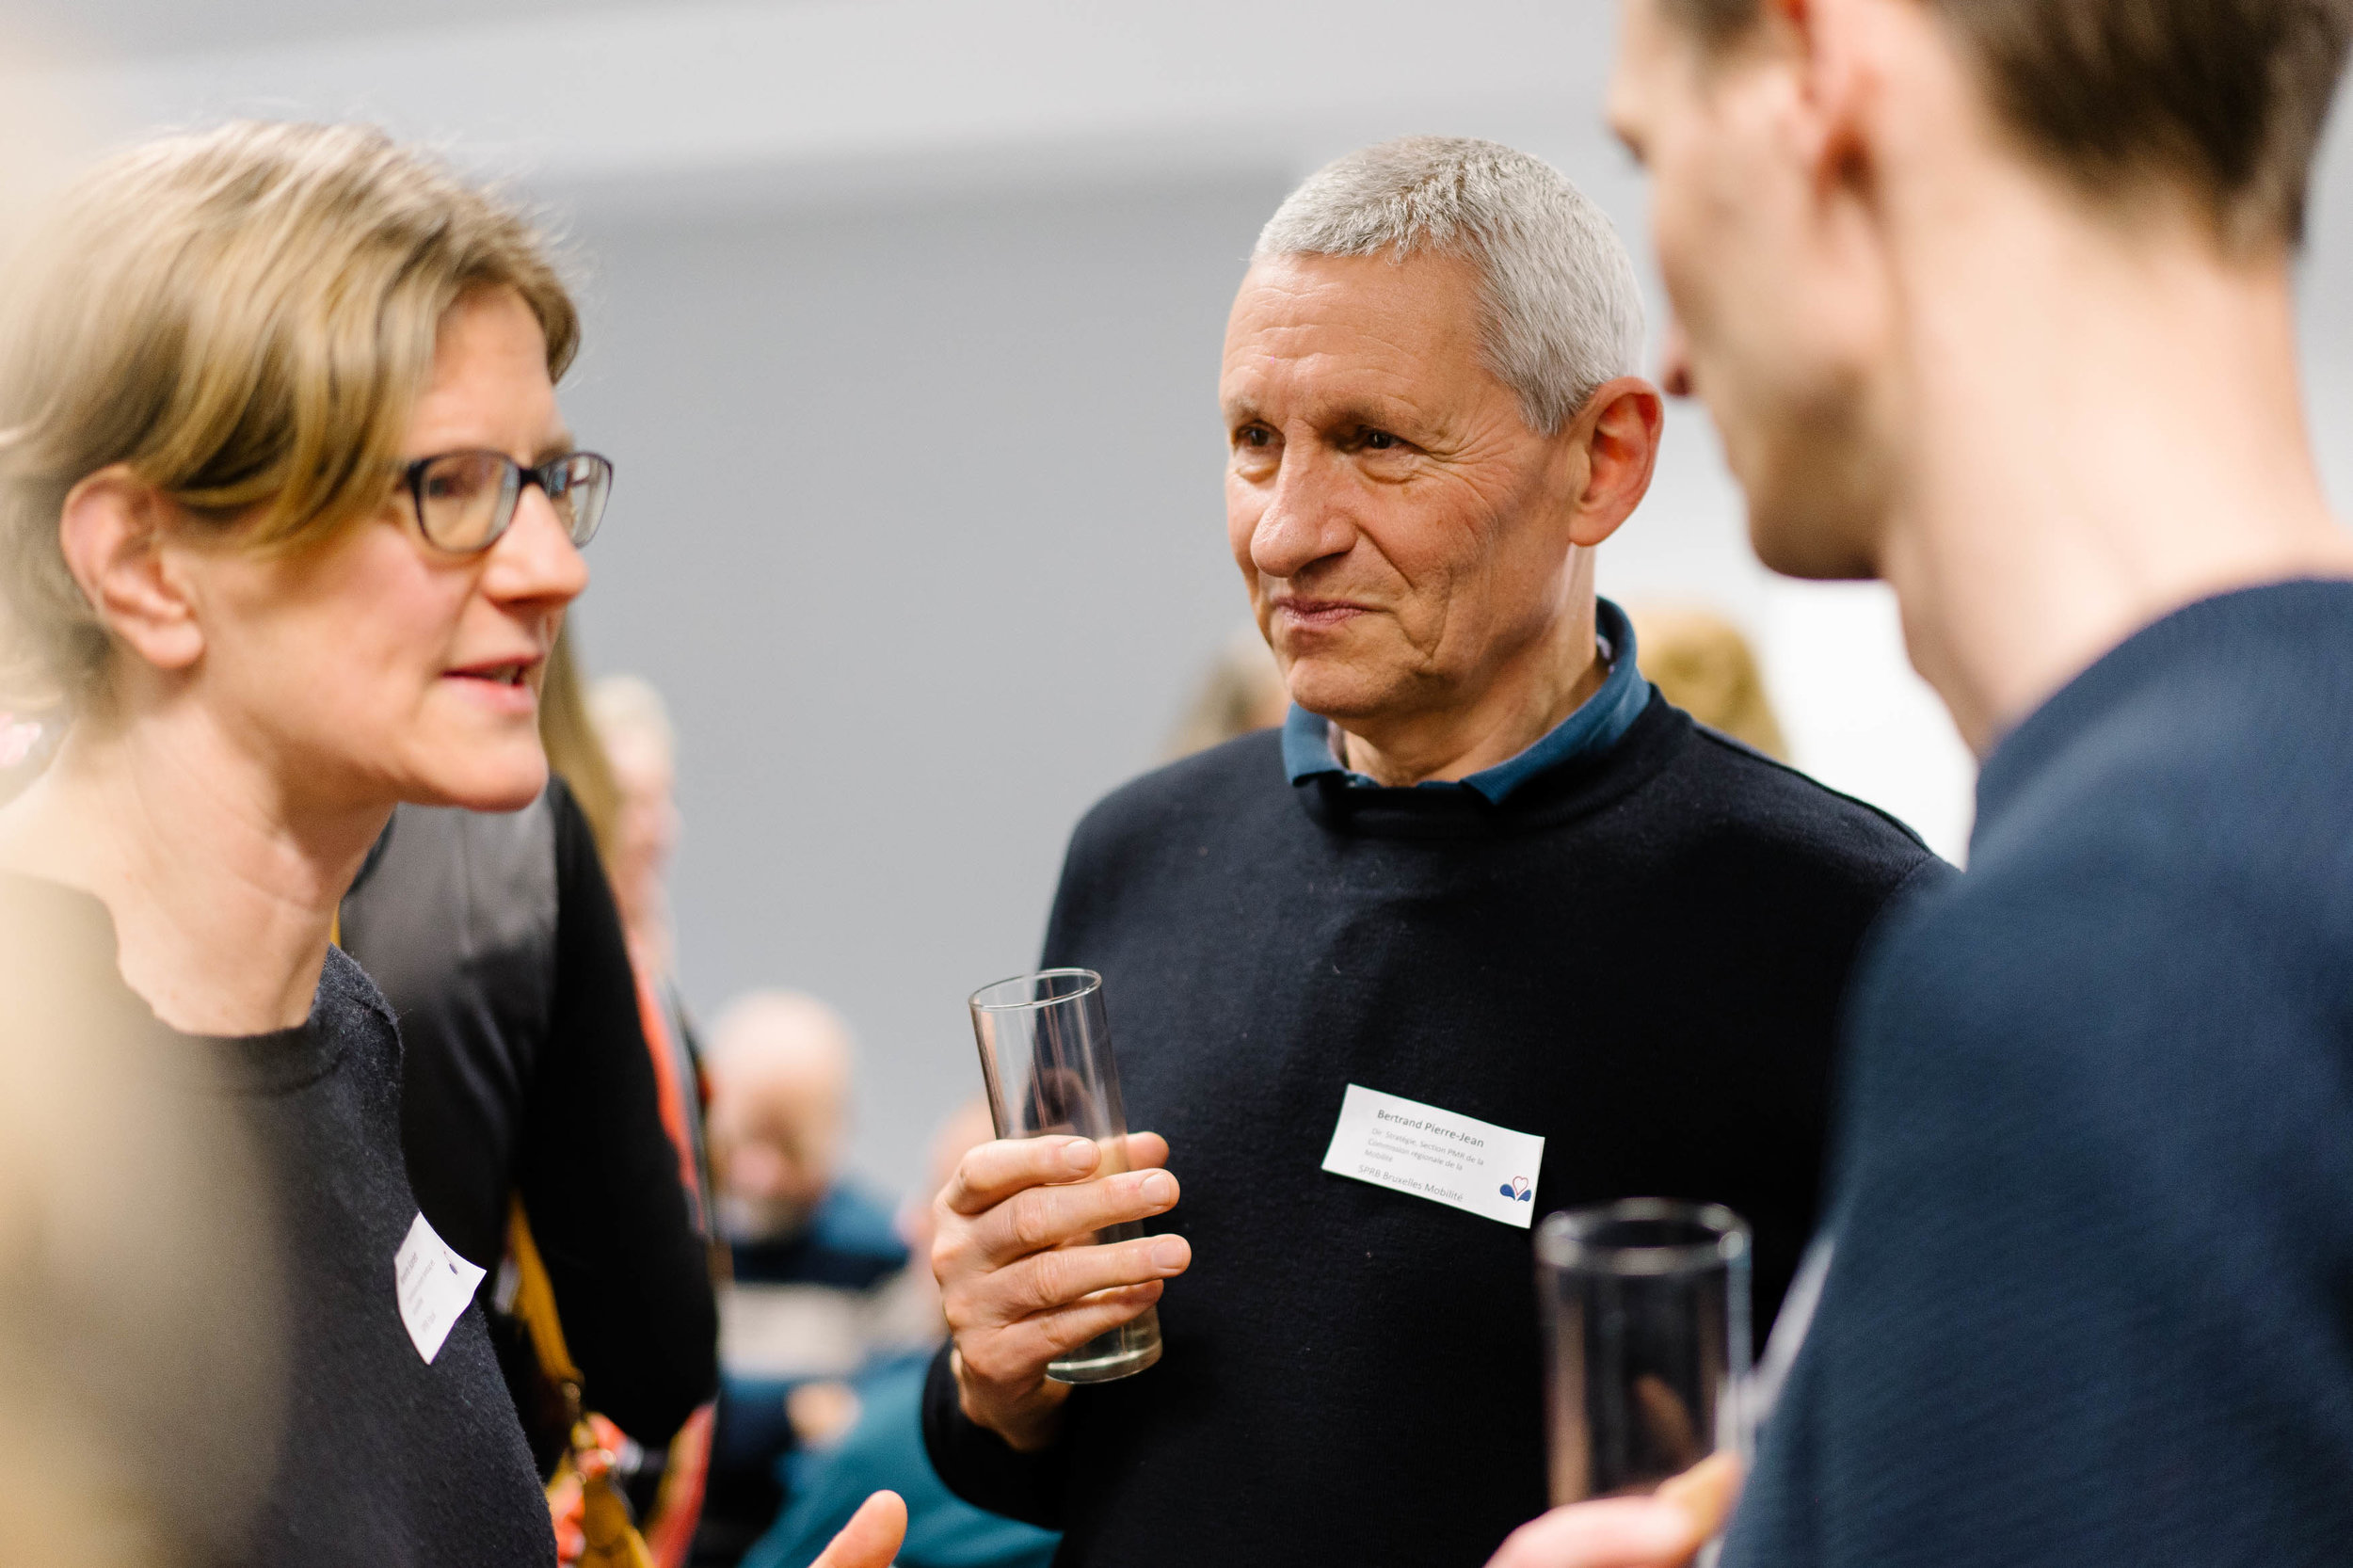 photographe-conference-bruxelles-corporate-24.jpg